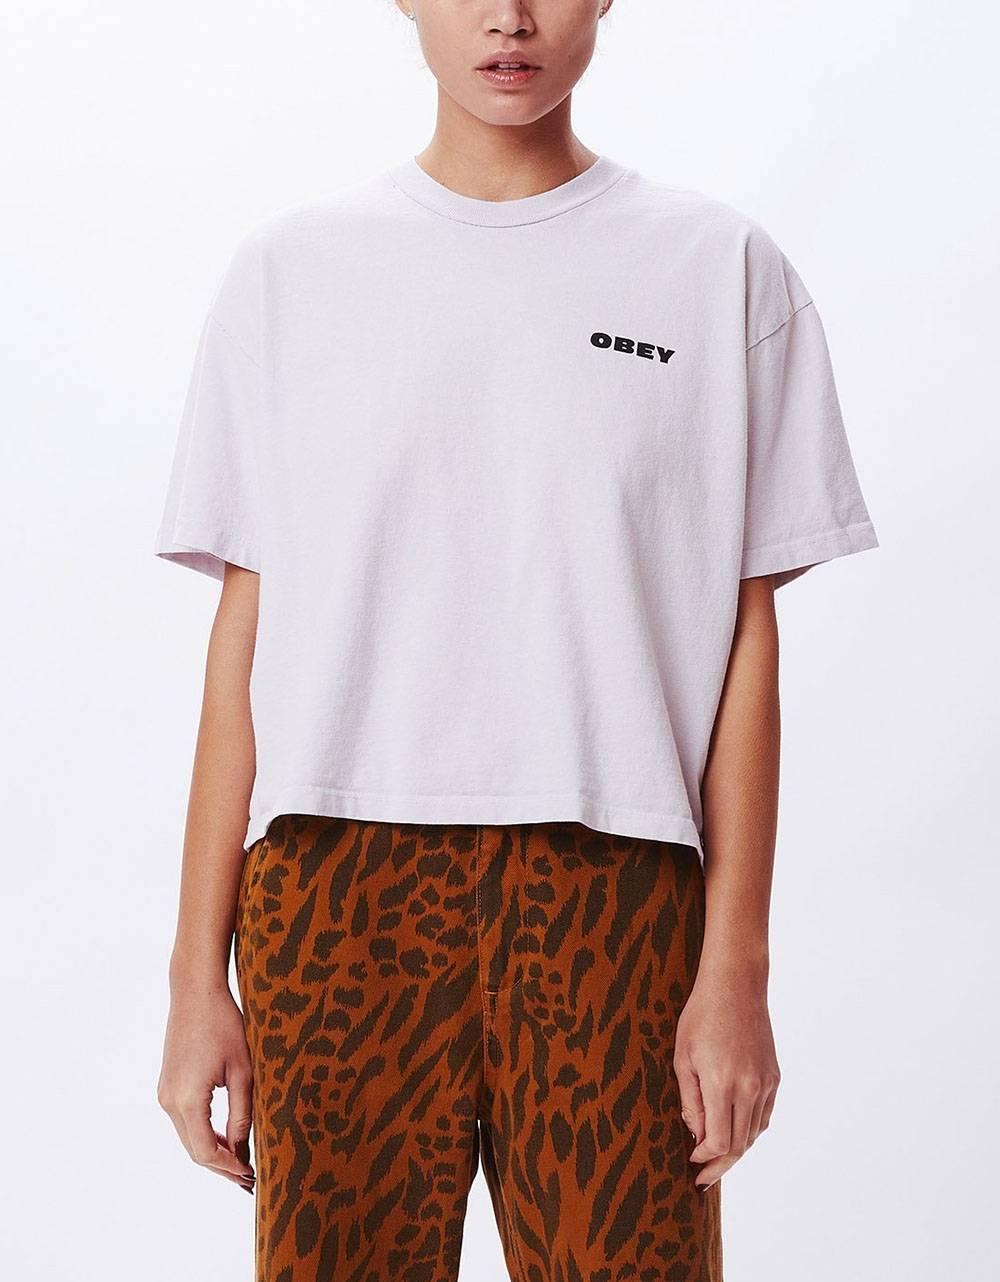 Obey Woman demolition crew custom crop tee - lilac hint obey T-shirt 36,89€